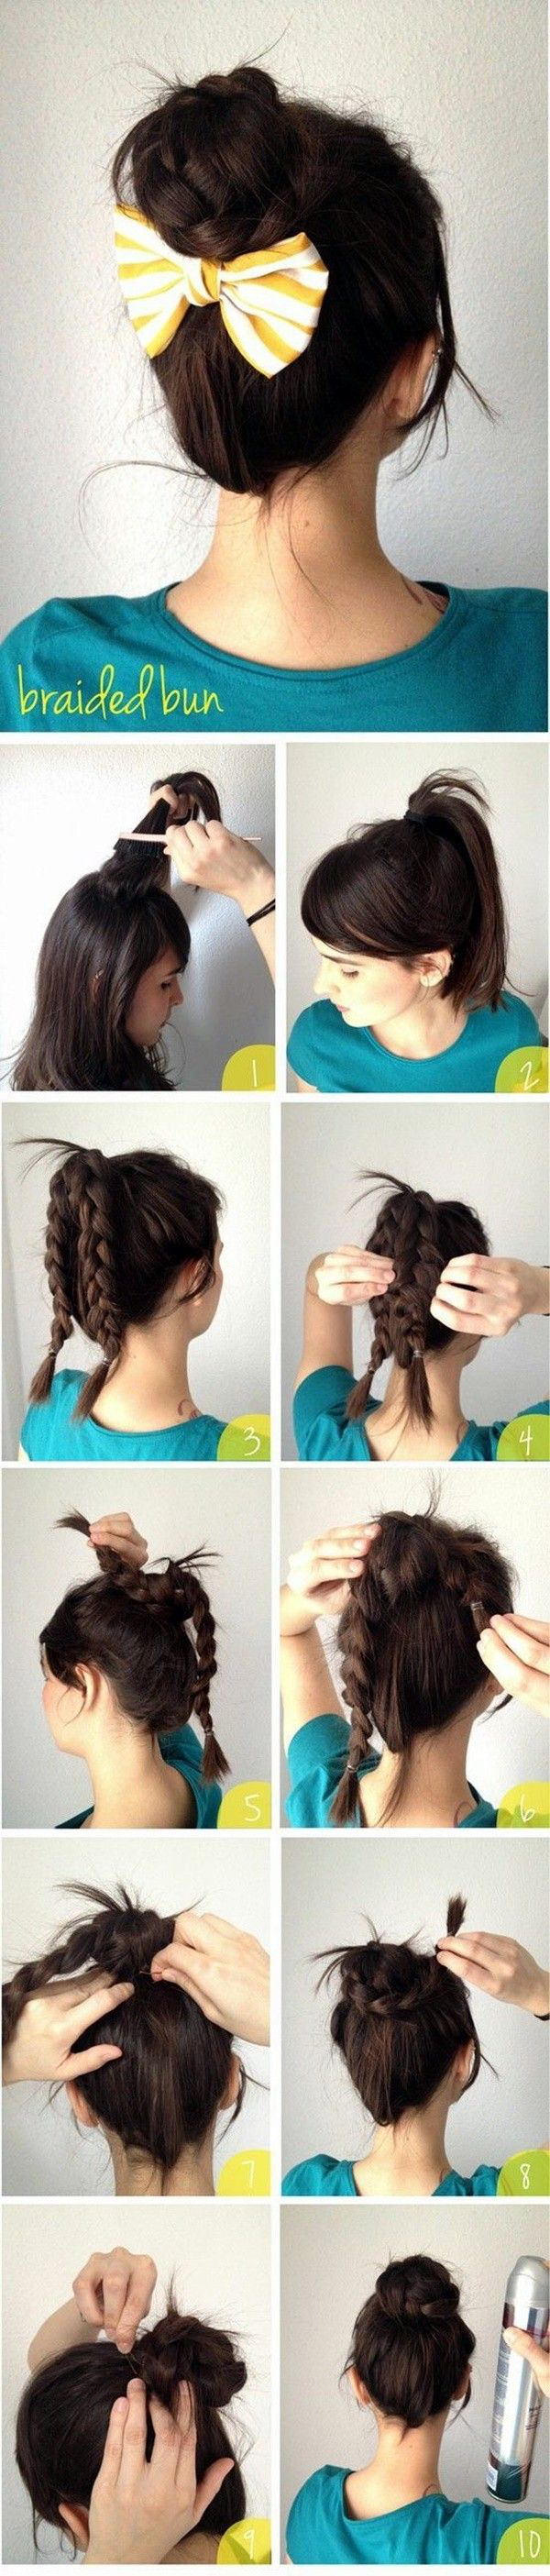 Quickhairstyletutorialsforofficewomen easy hairstyles for